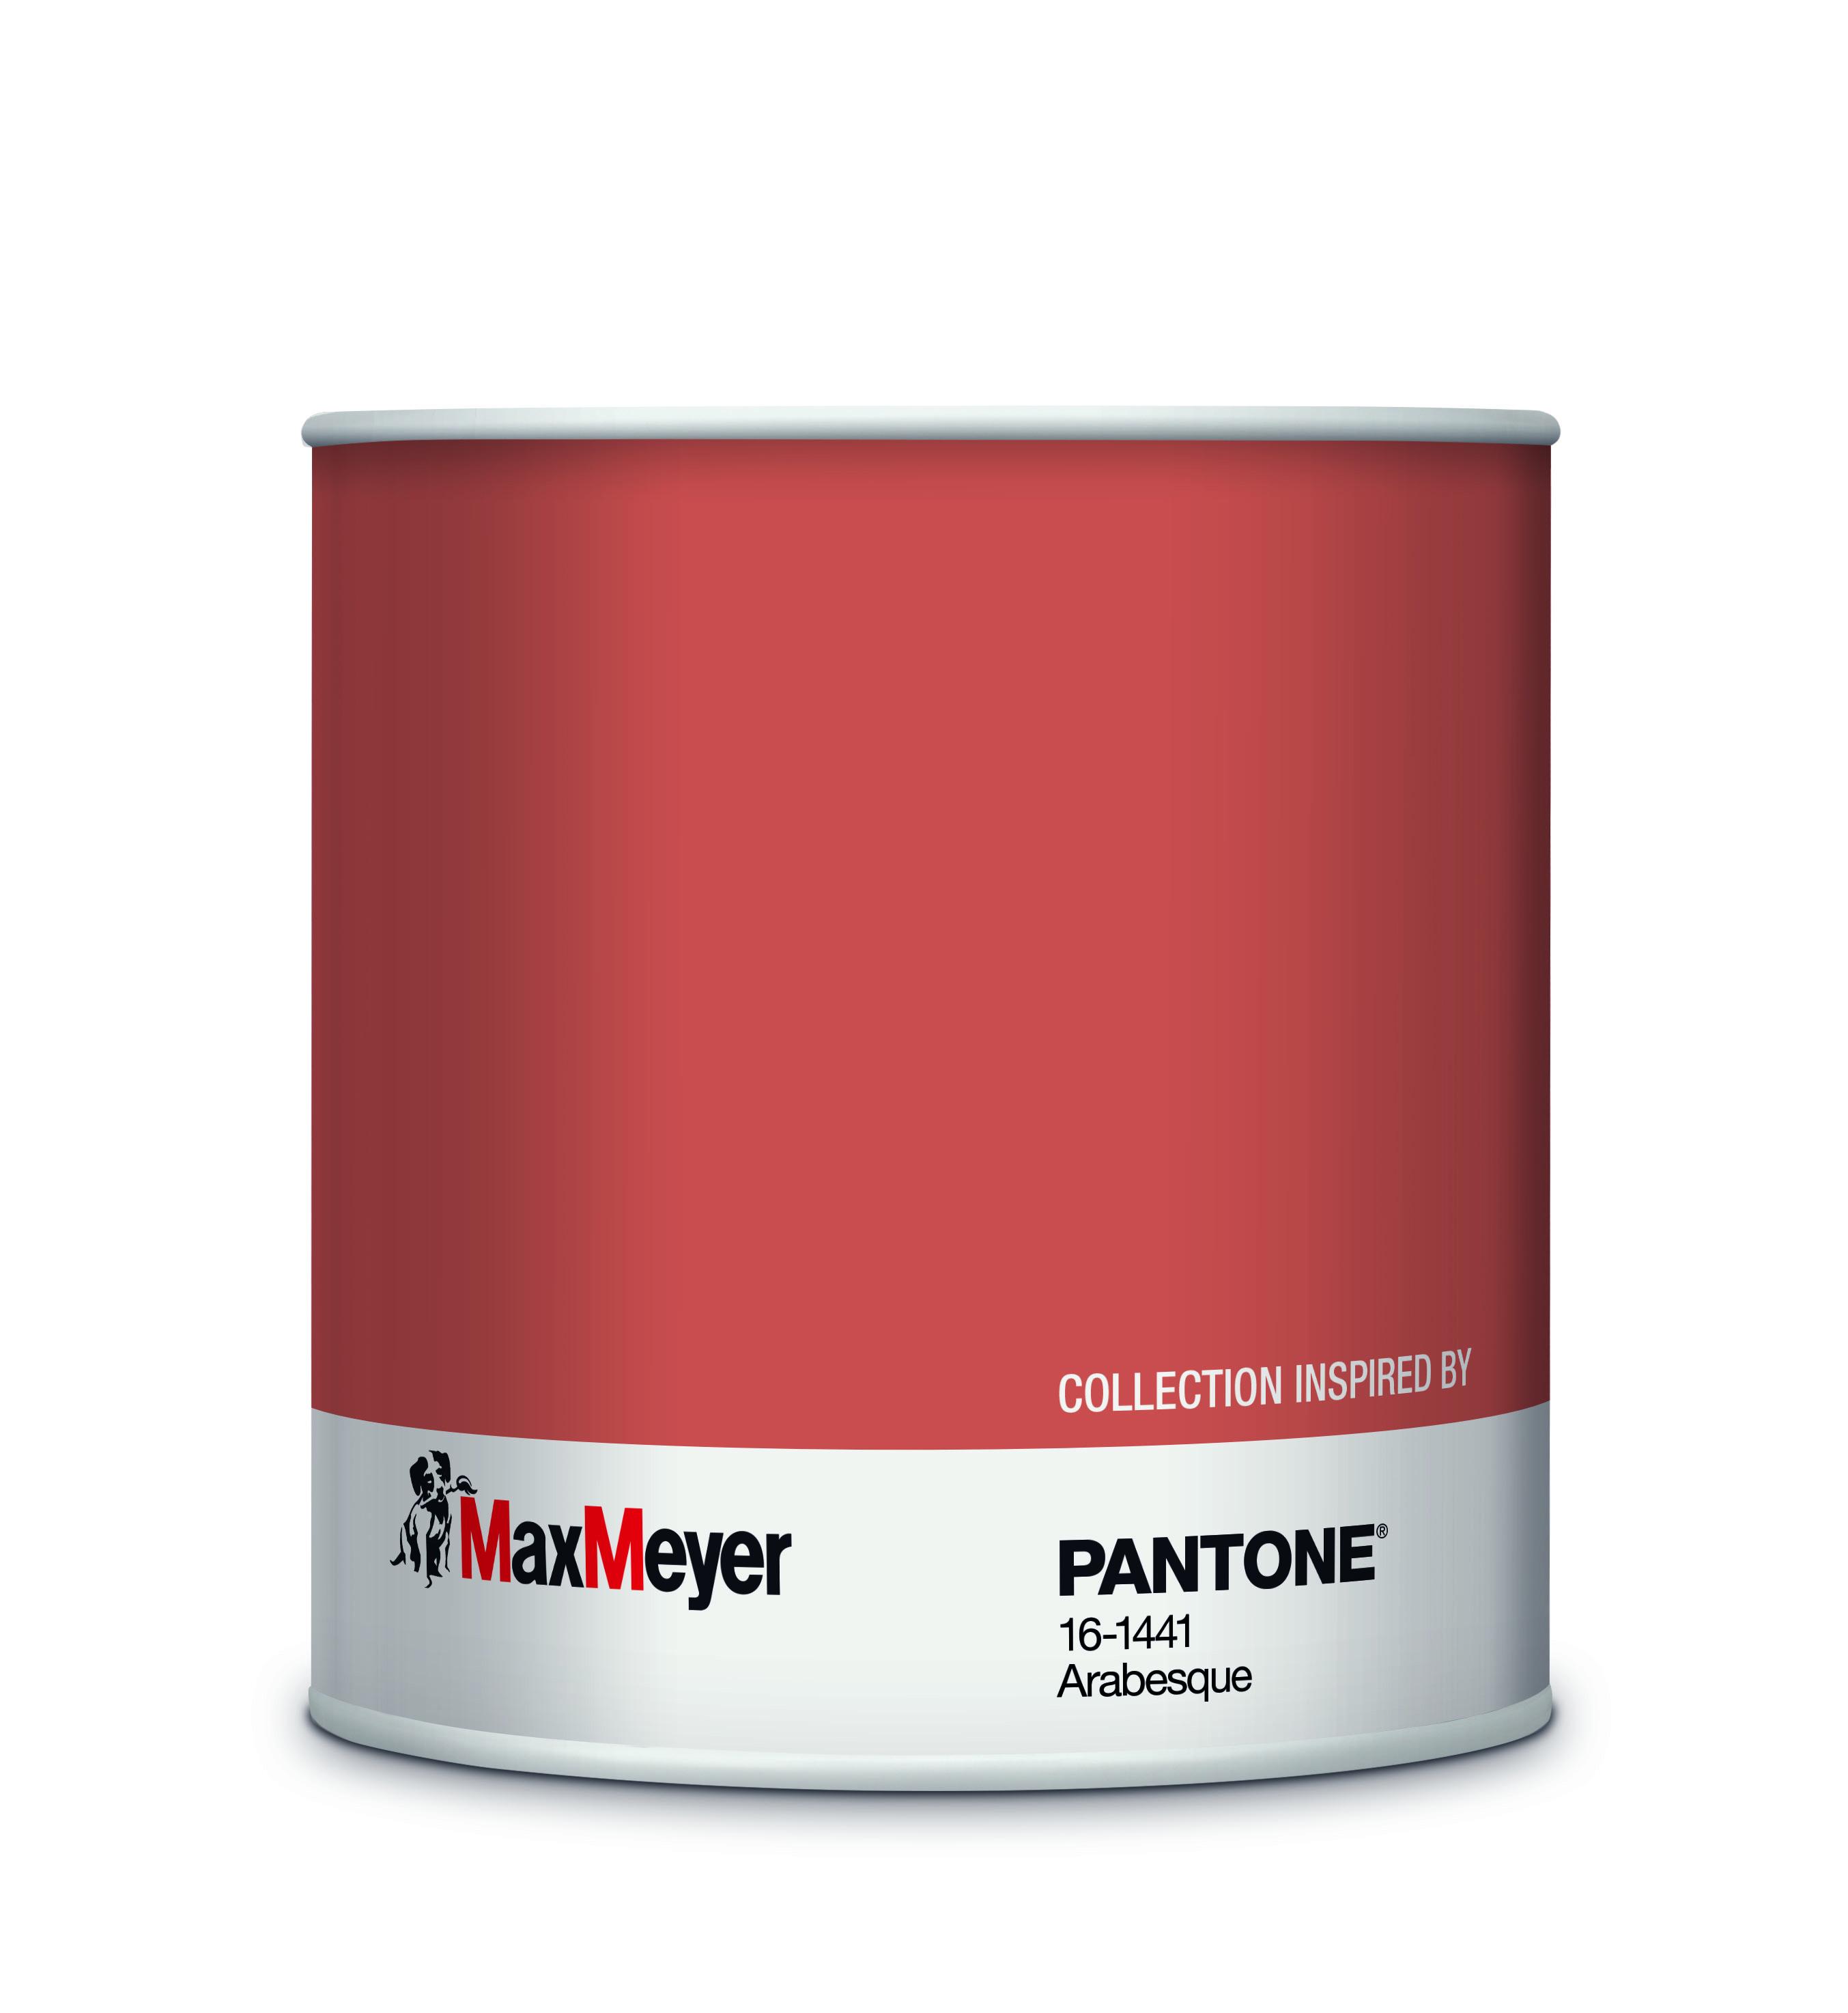 Le Pitture Maxmeyer By Pantone In Esclusiva Da Leroy Merlin